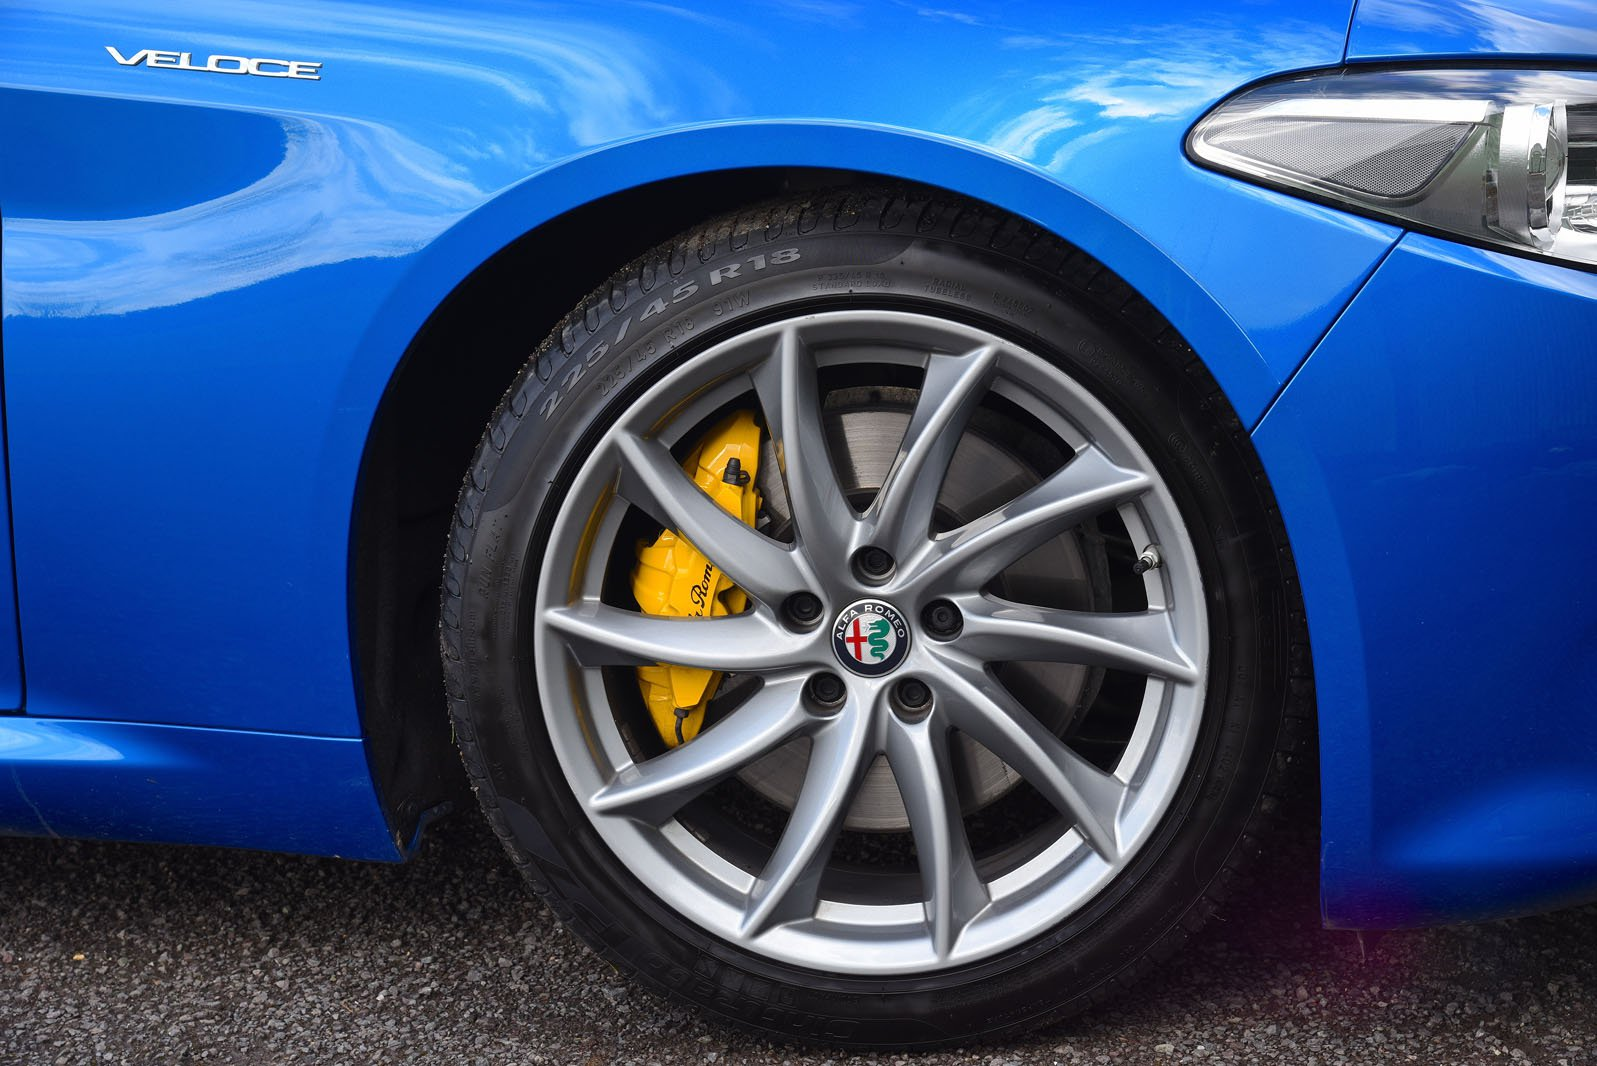 Alfa Romeo Giulia 2018 right front wheel detail